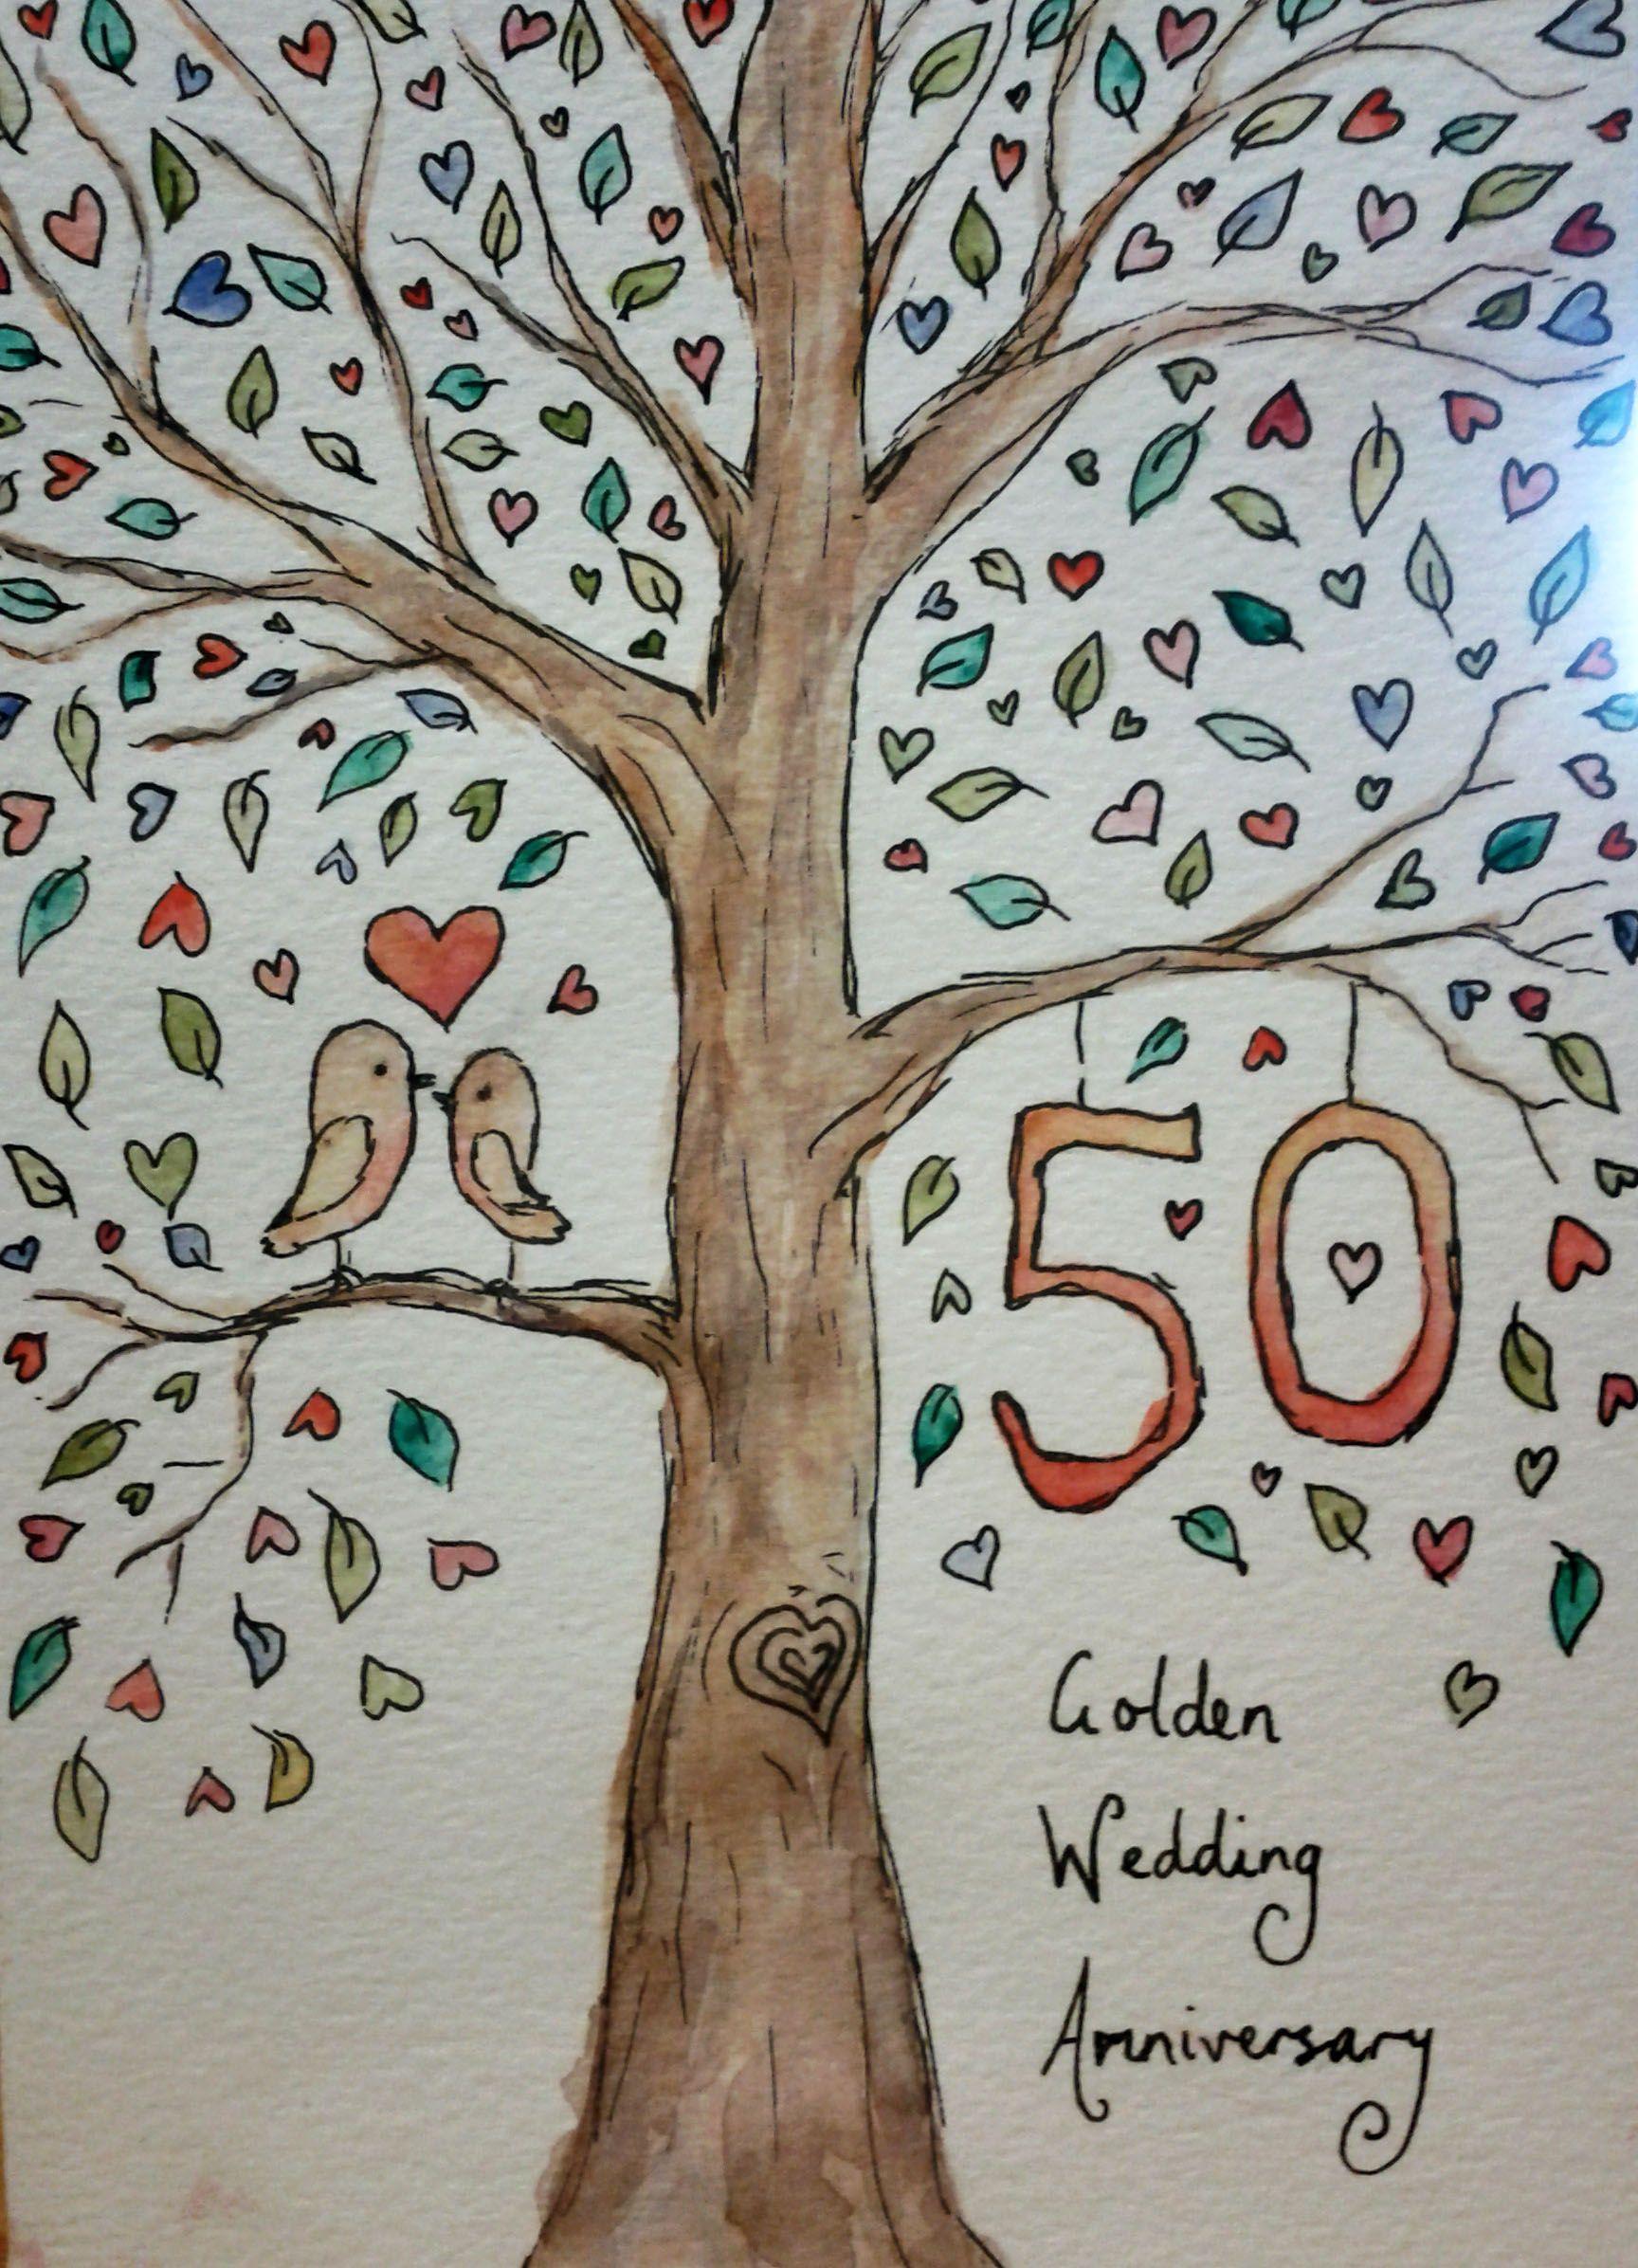 50th Anniversary Cards 50th Wedding Anniversary Anniversary Cards